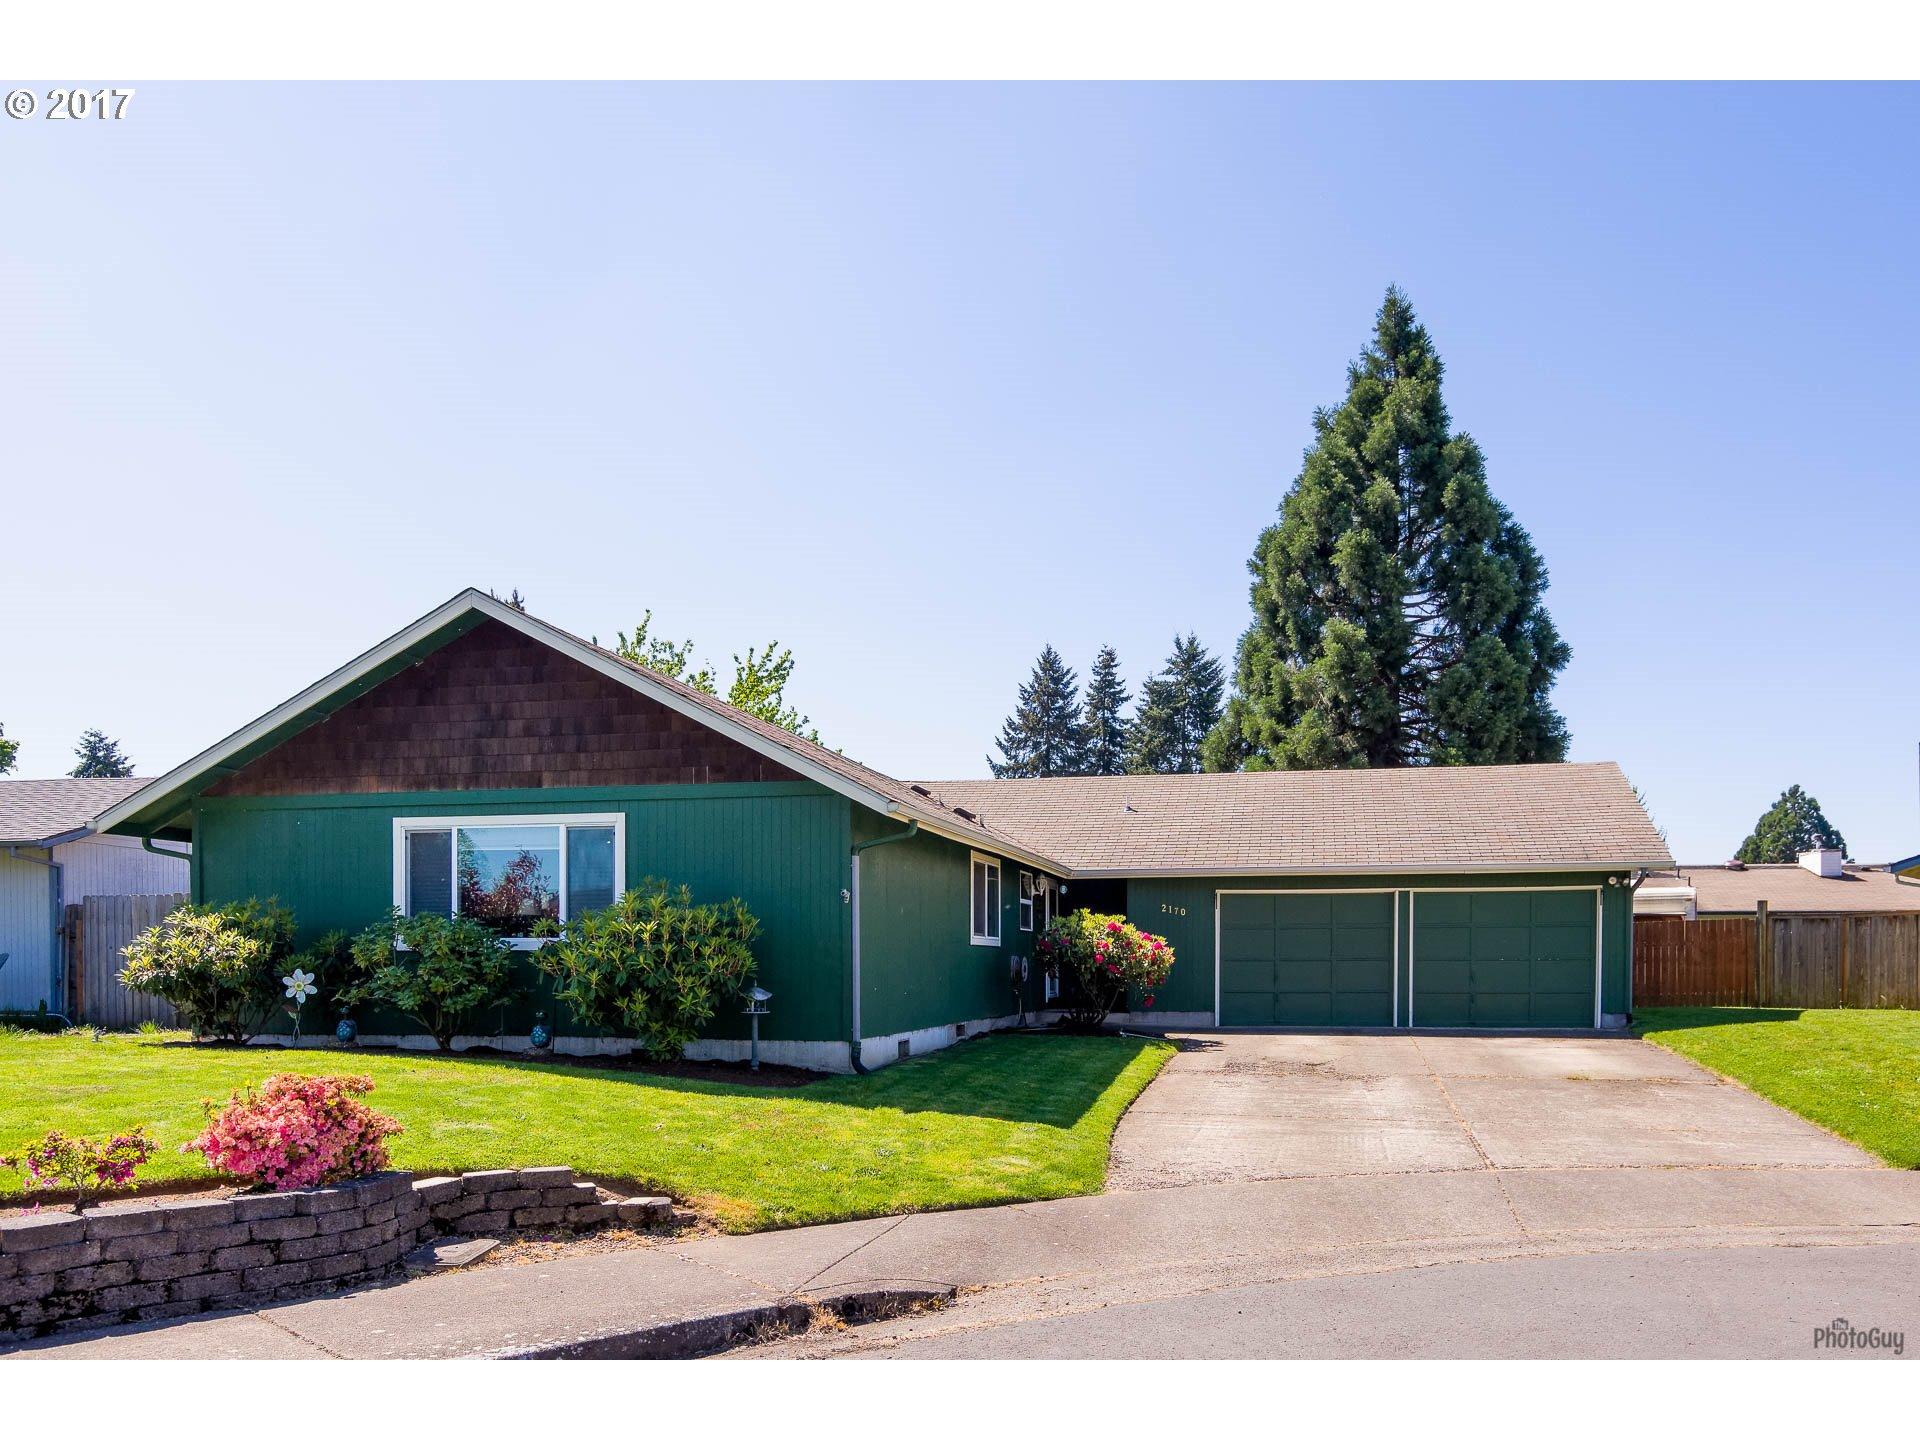 2170 AMIRANTE ST, Eugene OR 97402